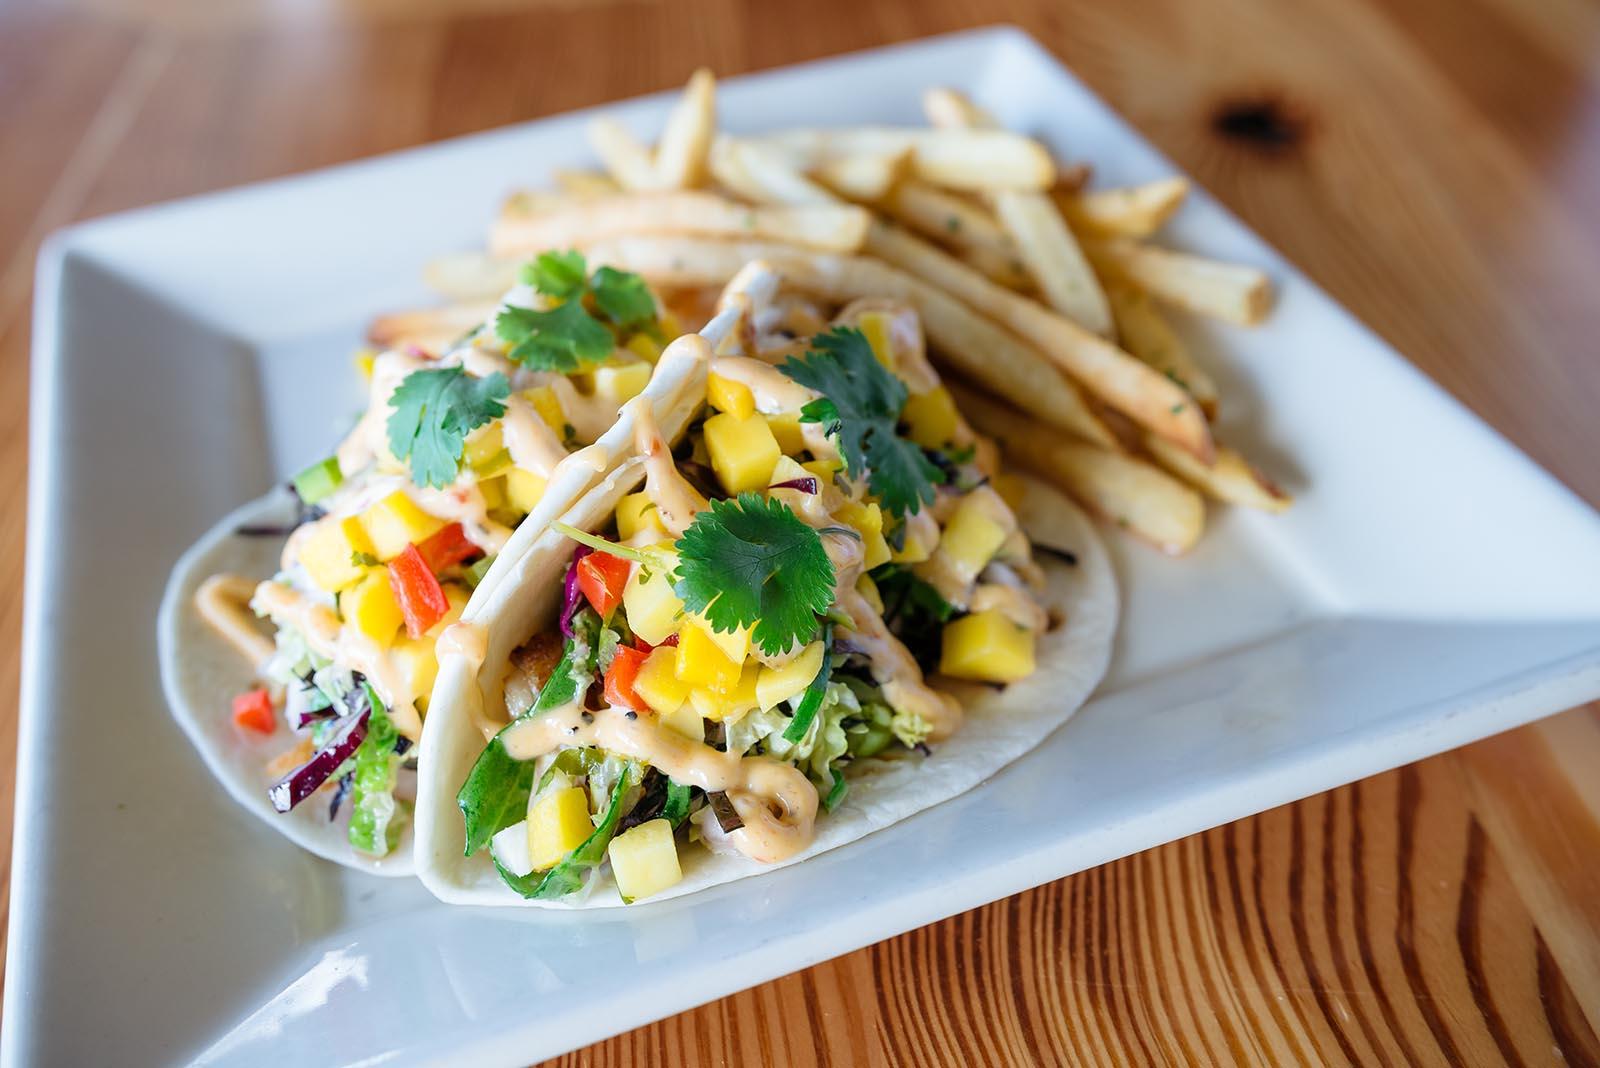 Fish Tacos: fresh grilled local catch with mango jicama salsa, bok choy napa slaw, and chipotle aioli